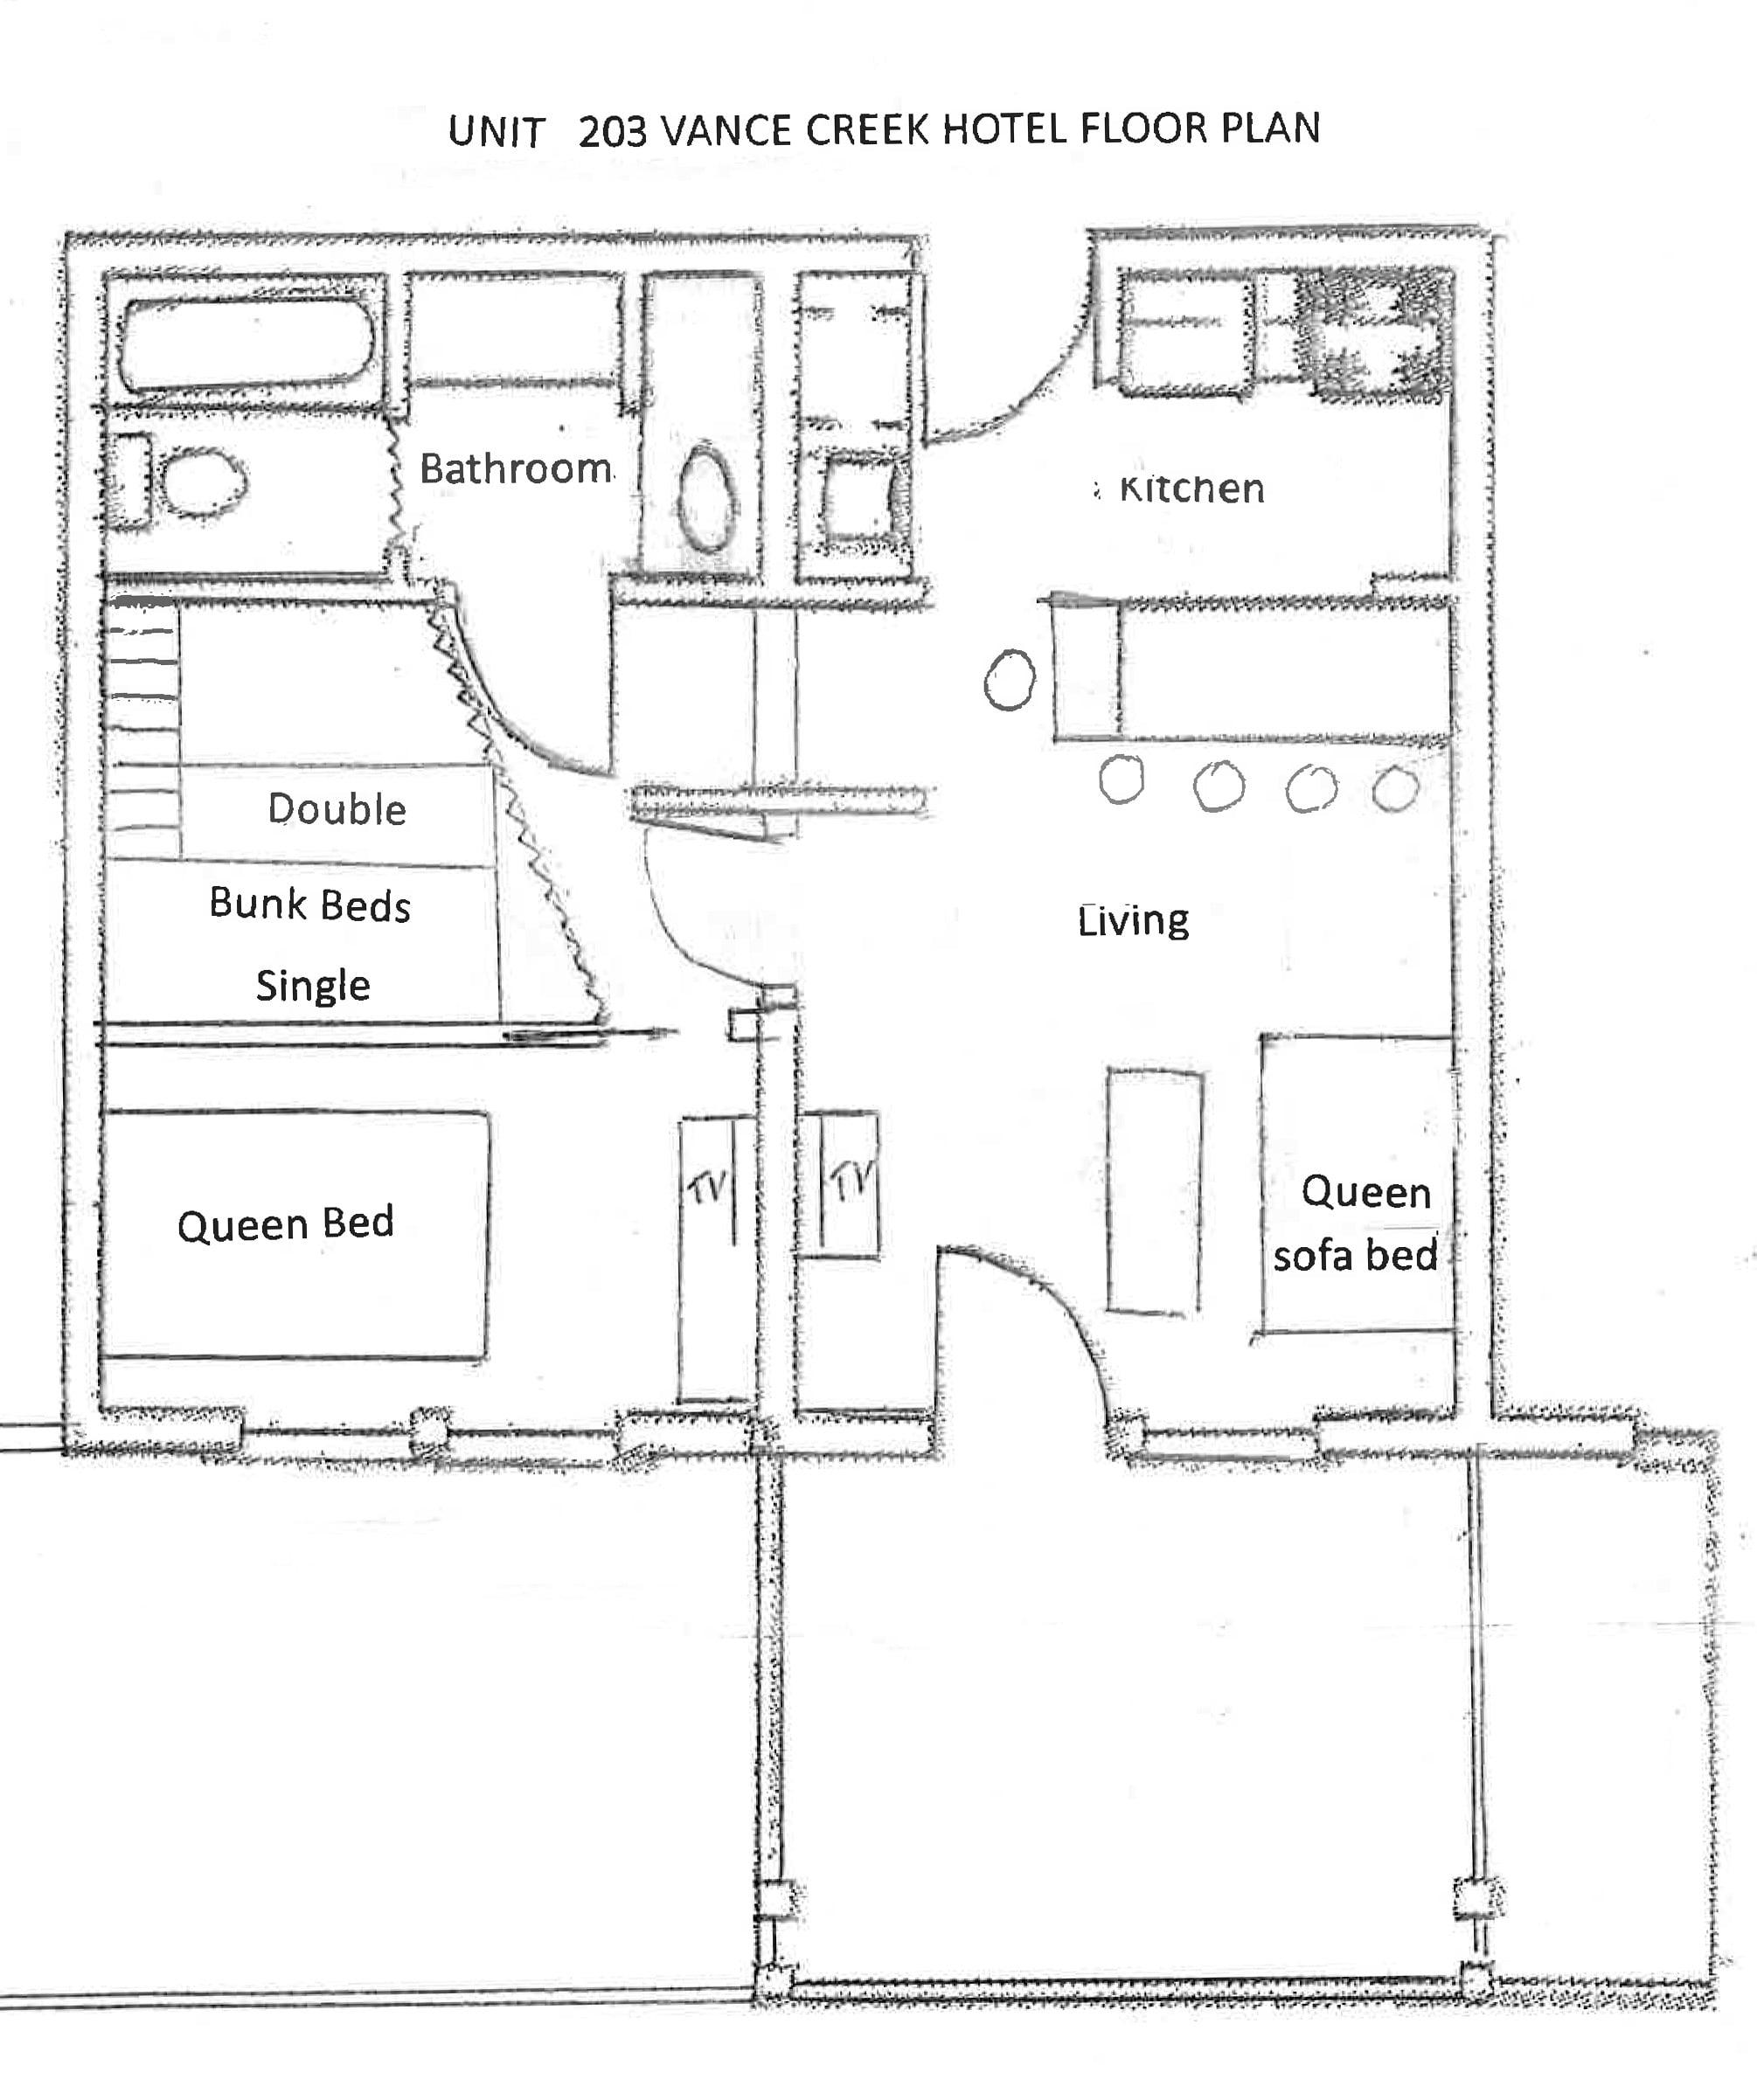 VC203_floor_plan.jpg